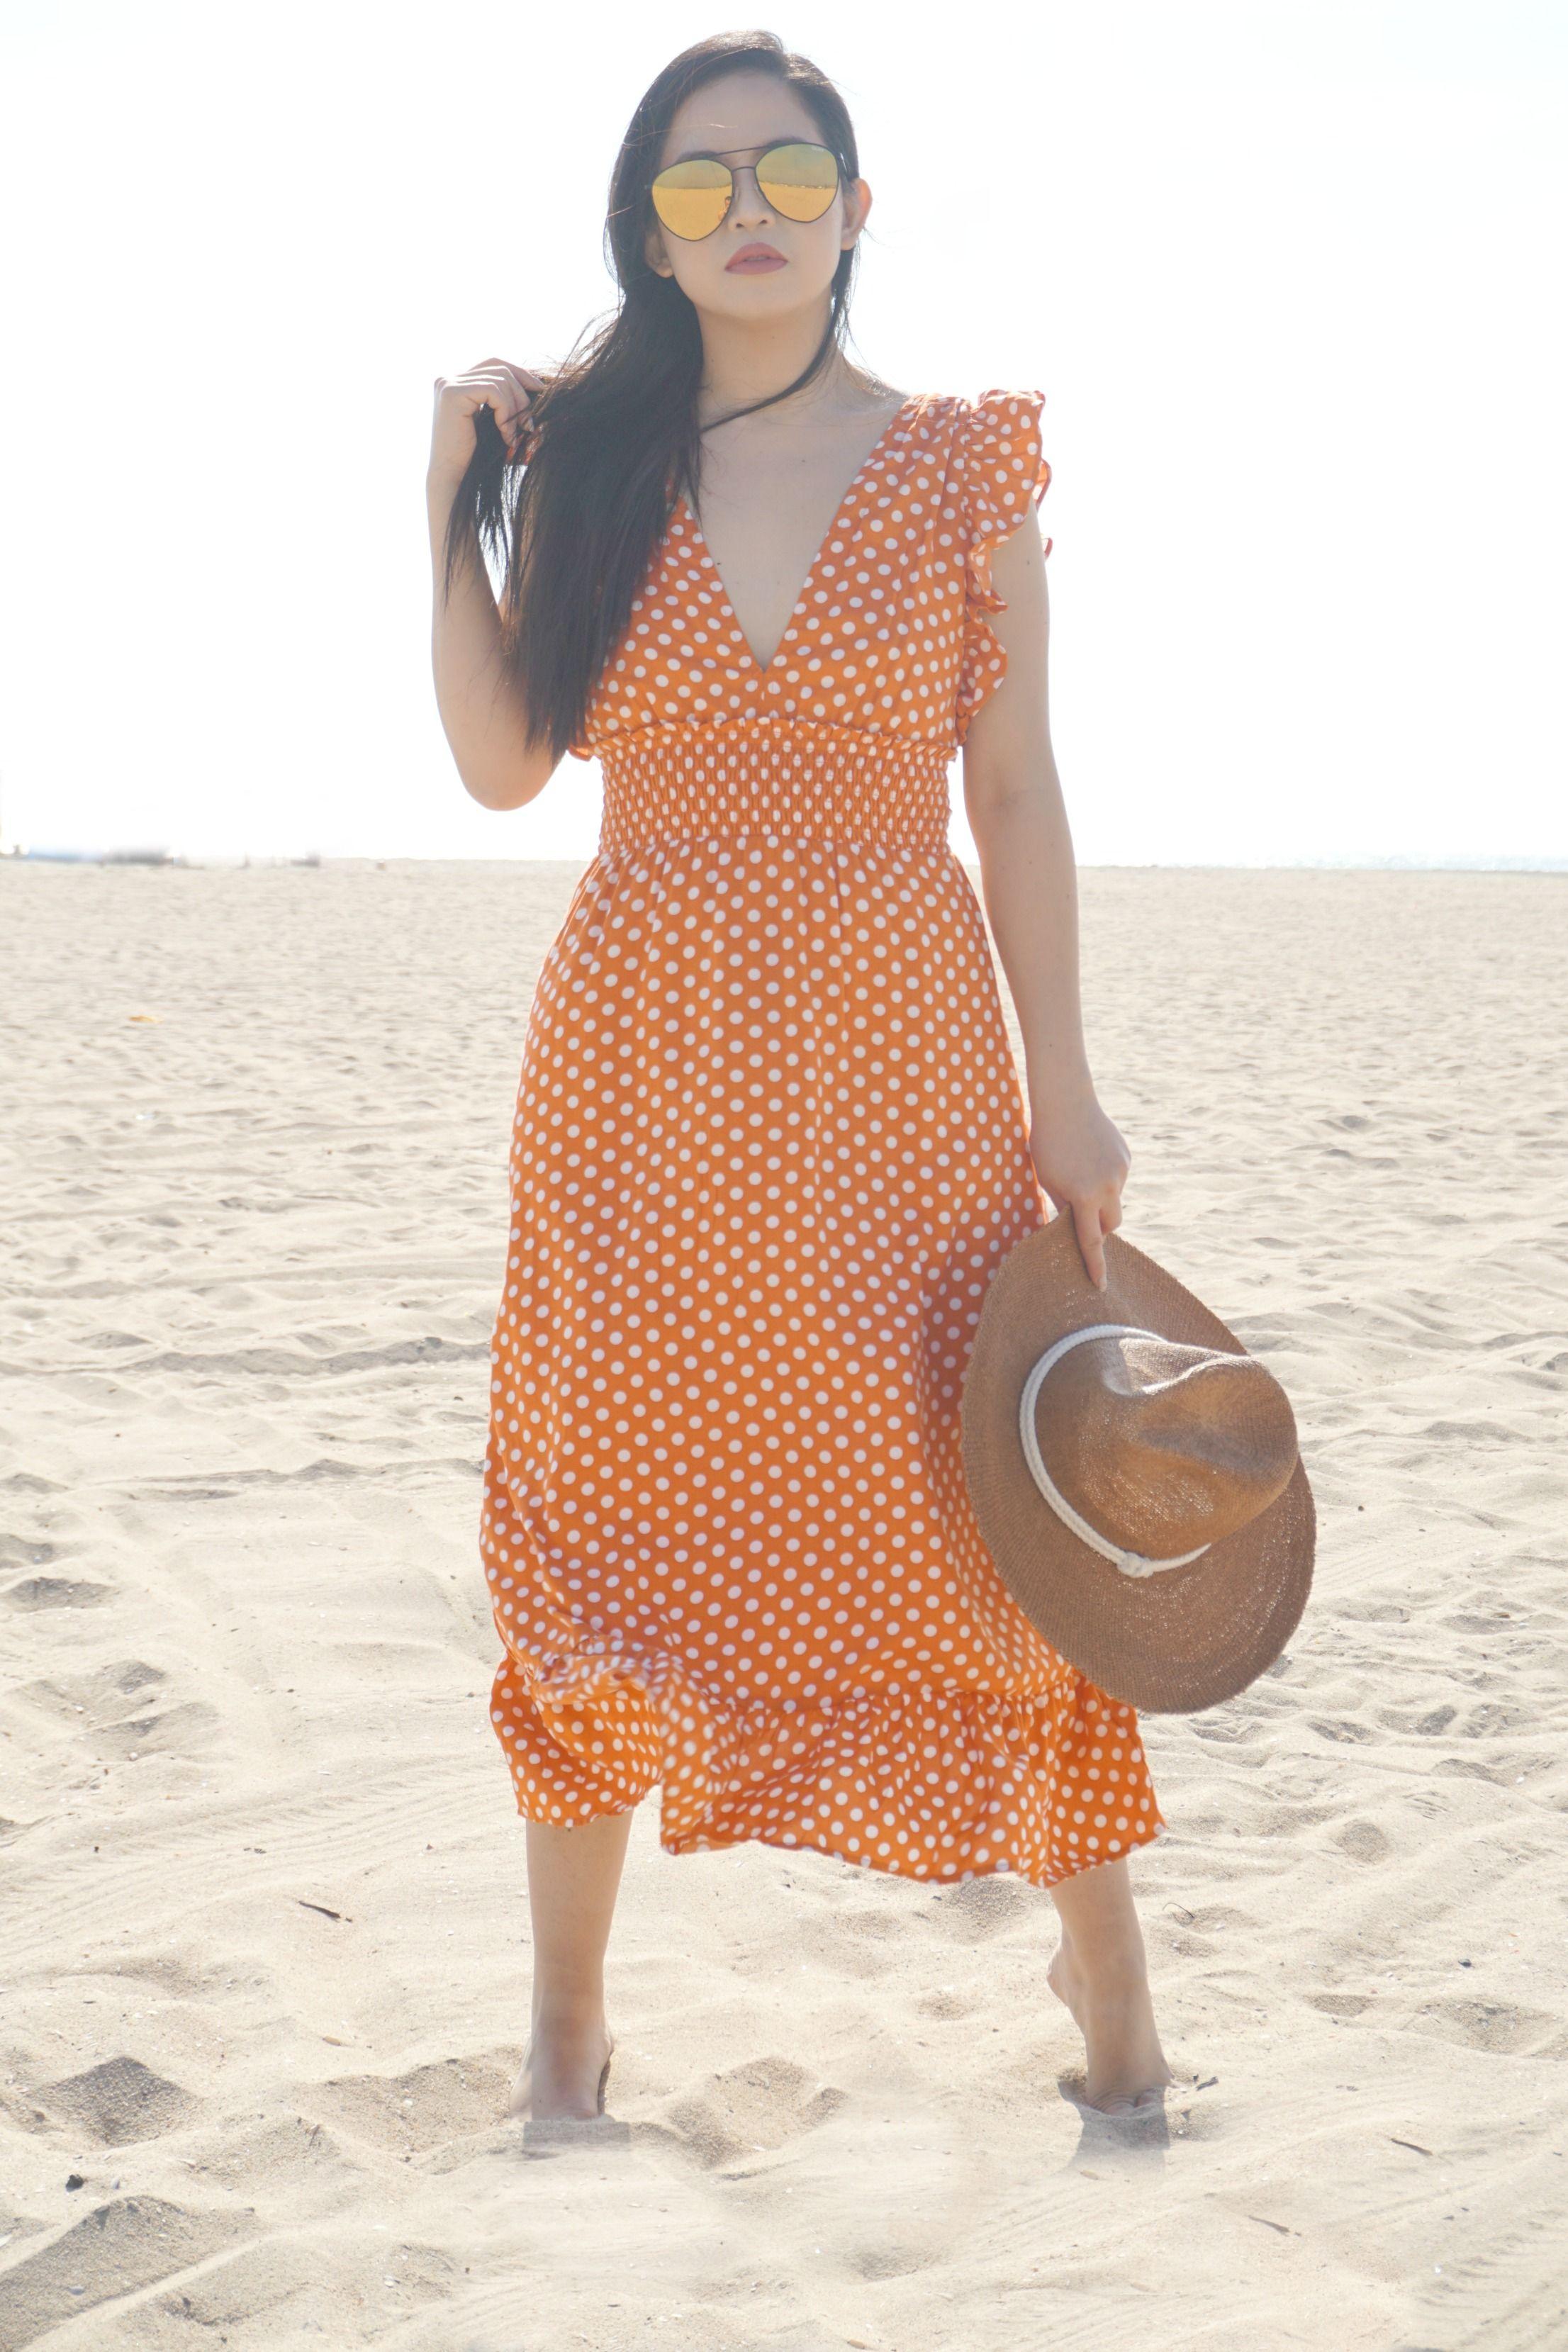 The Perfect Beach Picnic Dress Of Course It Has Polka Dots Polkadots Polkadot Classicsummerstyle Vintageglam Th Summer Fashion Picnic Dress Polka Dots [ 3318 x 2212 Pixel ]